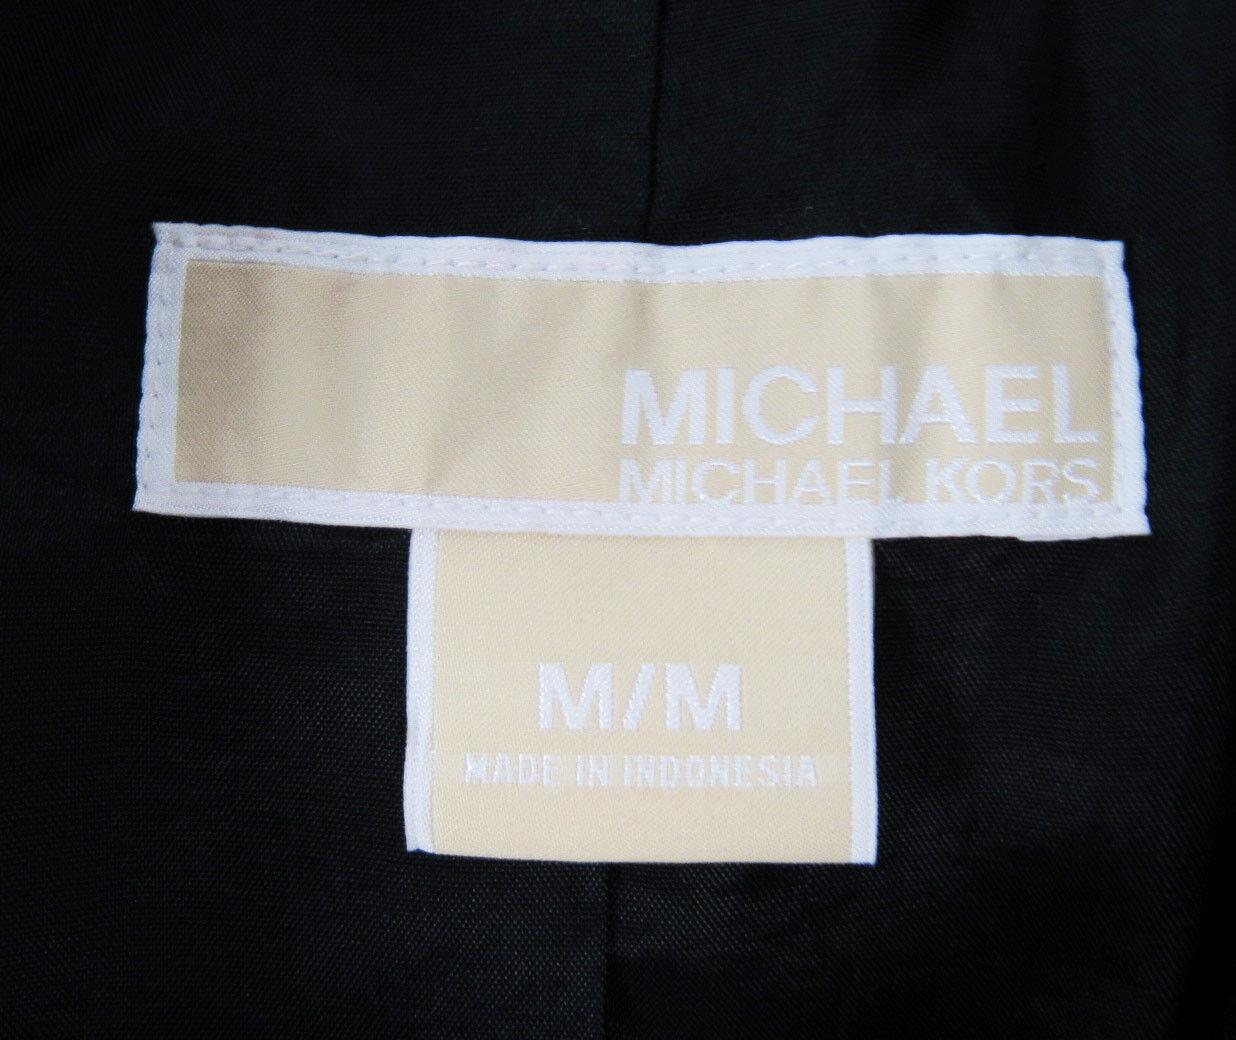 Michael Kors,Neuwertig,Damen,Jacke,34 Arm,SchwarzWeiß,M